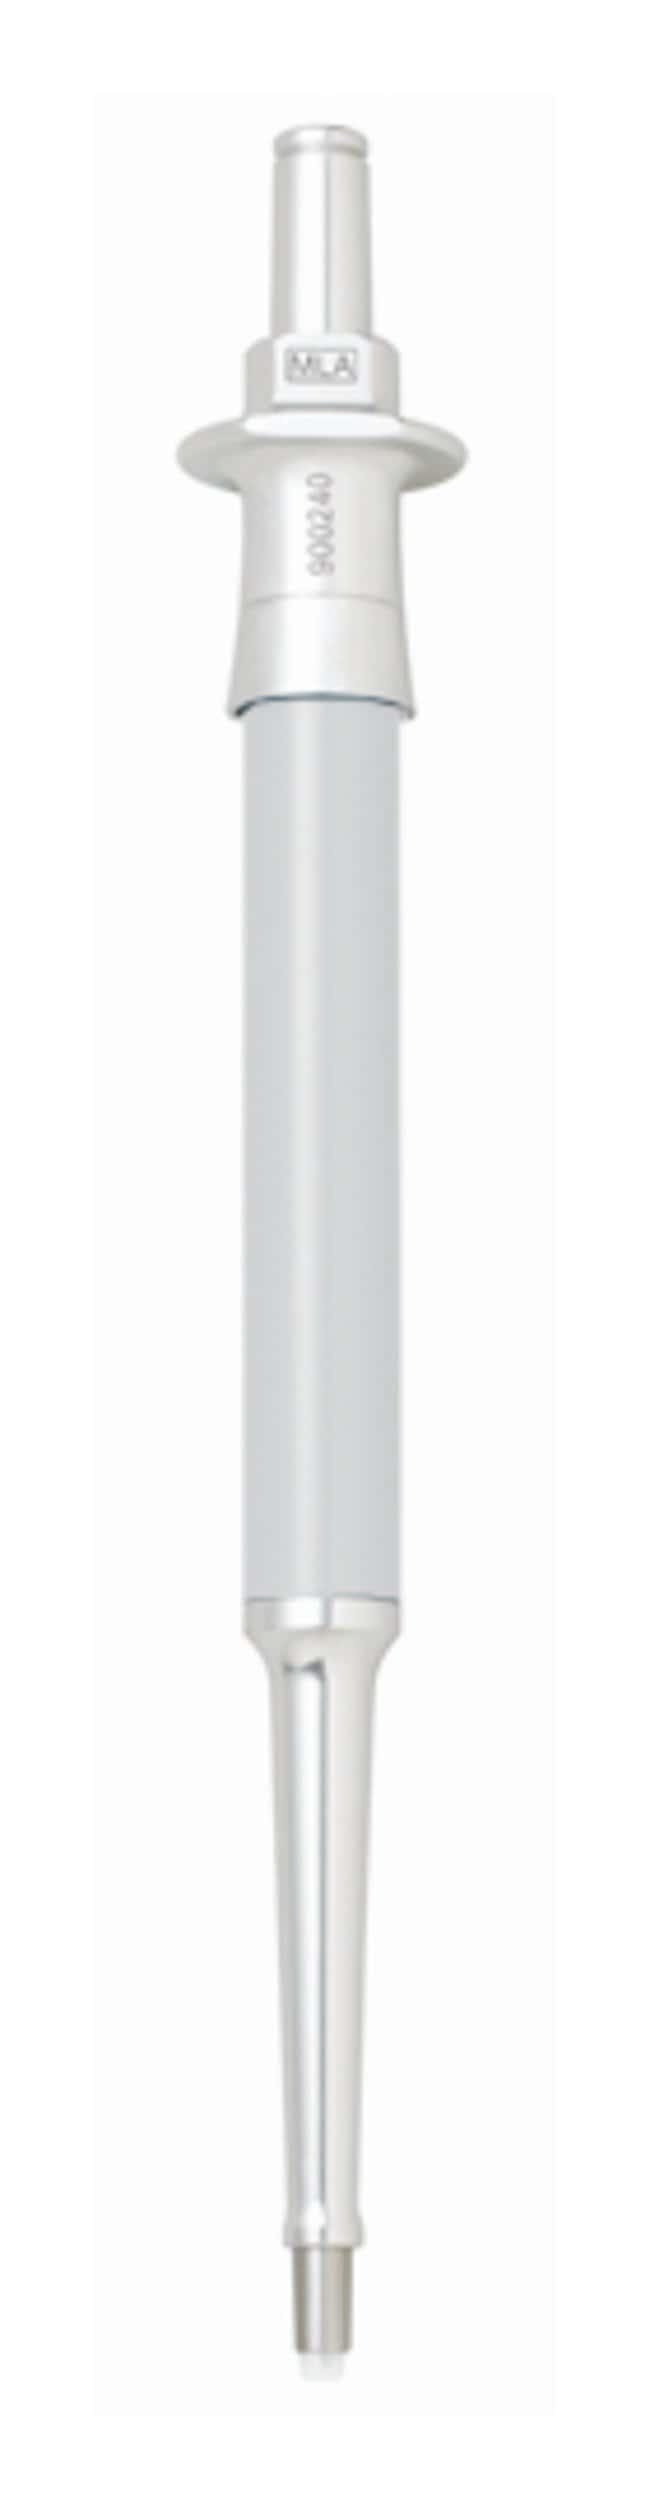 VistaLab™ TechnologiesMLA™ D-Tipper™ Pipetters Accuracy: 1.00%, Precision: 0.50%, Volume: 400 μL, Color: Silver VistaLab™ TechnologiesMLA™ D-Tipper™ Pipetters